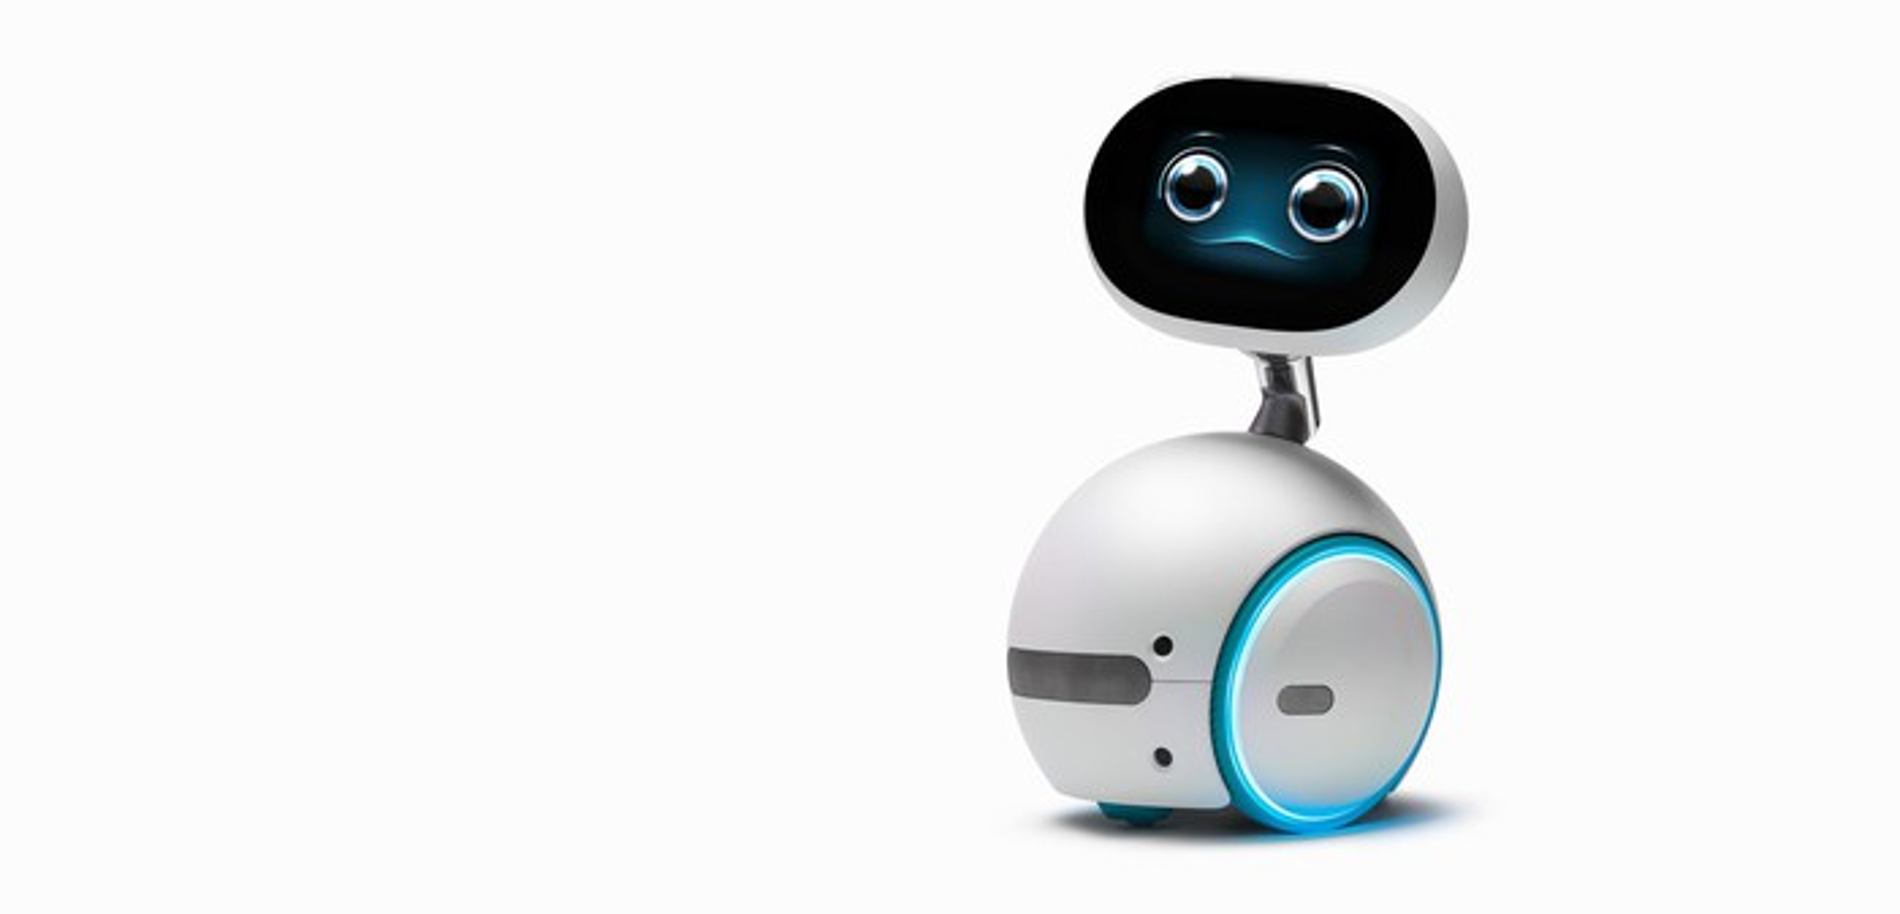 Asus' Zenbo home robot.